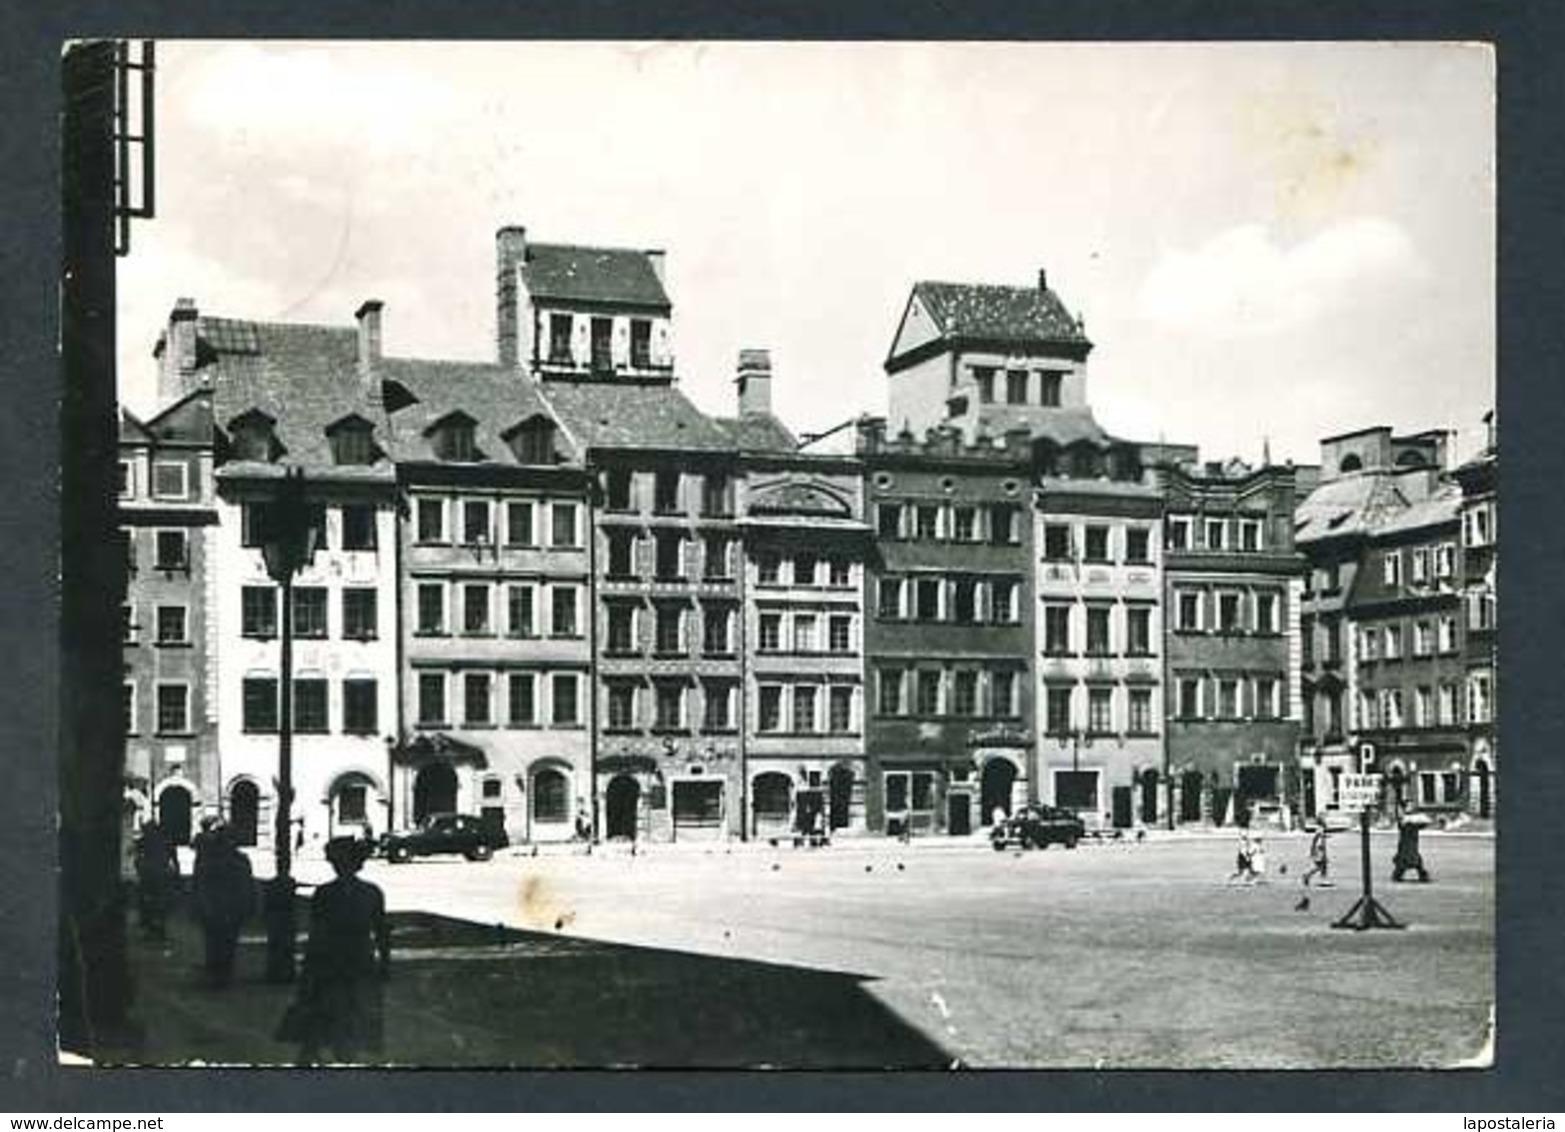 Polonia. Warszawa *Rynek Starego Miasta* Edit. K.A.W. Circulada 1961. - Polonia